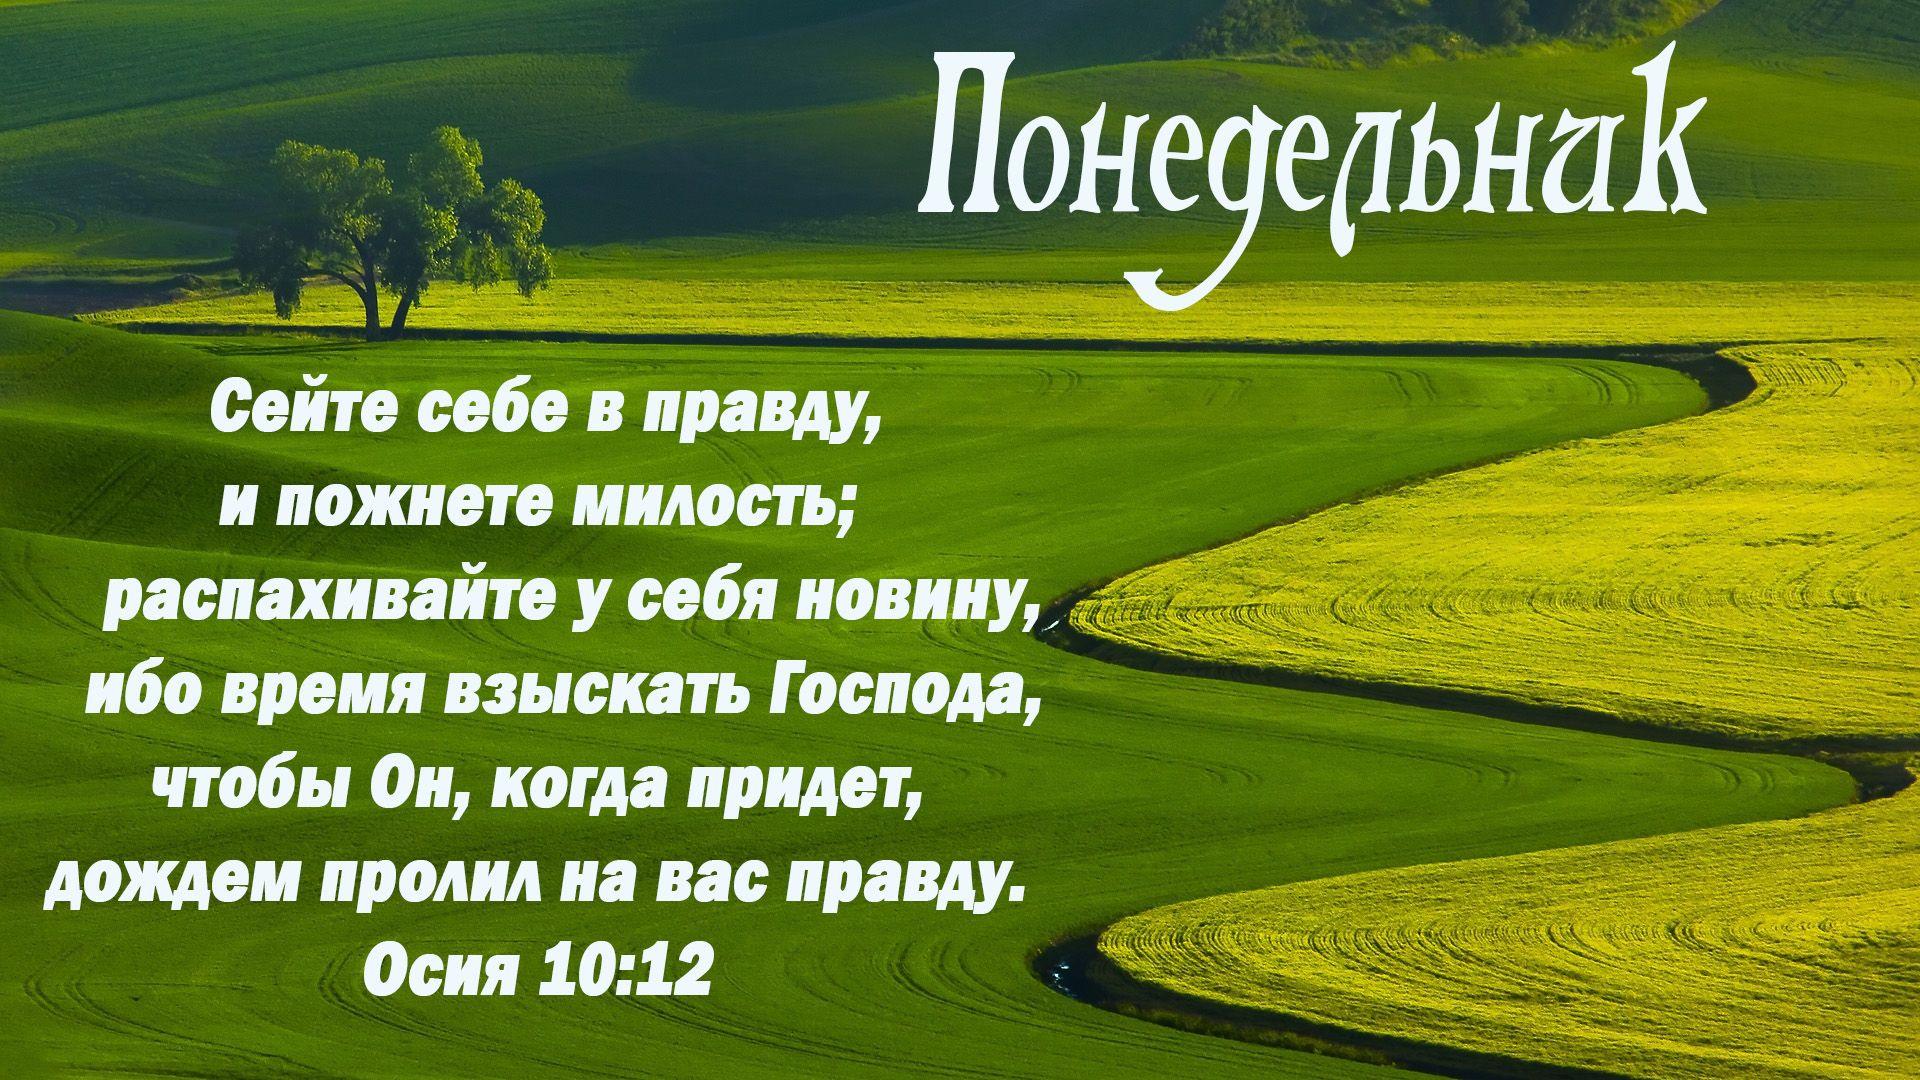 Pin by Христианские открытки on Дни недели Golf courses